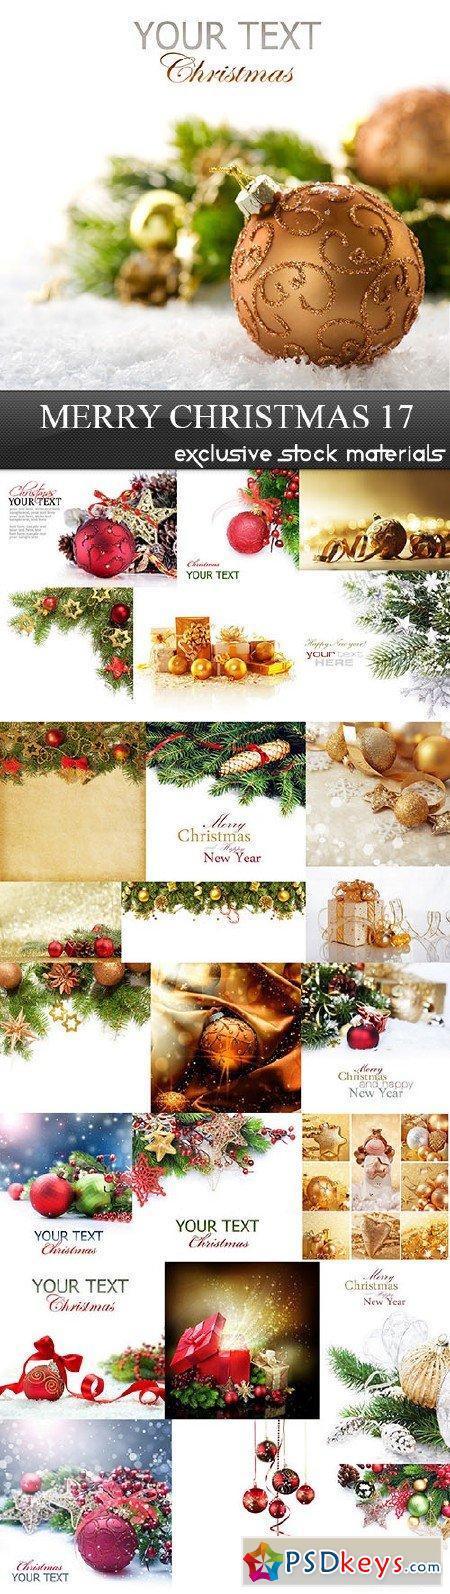 Merry Christmas 17, 25xUHQ JPEG